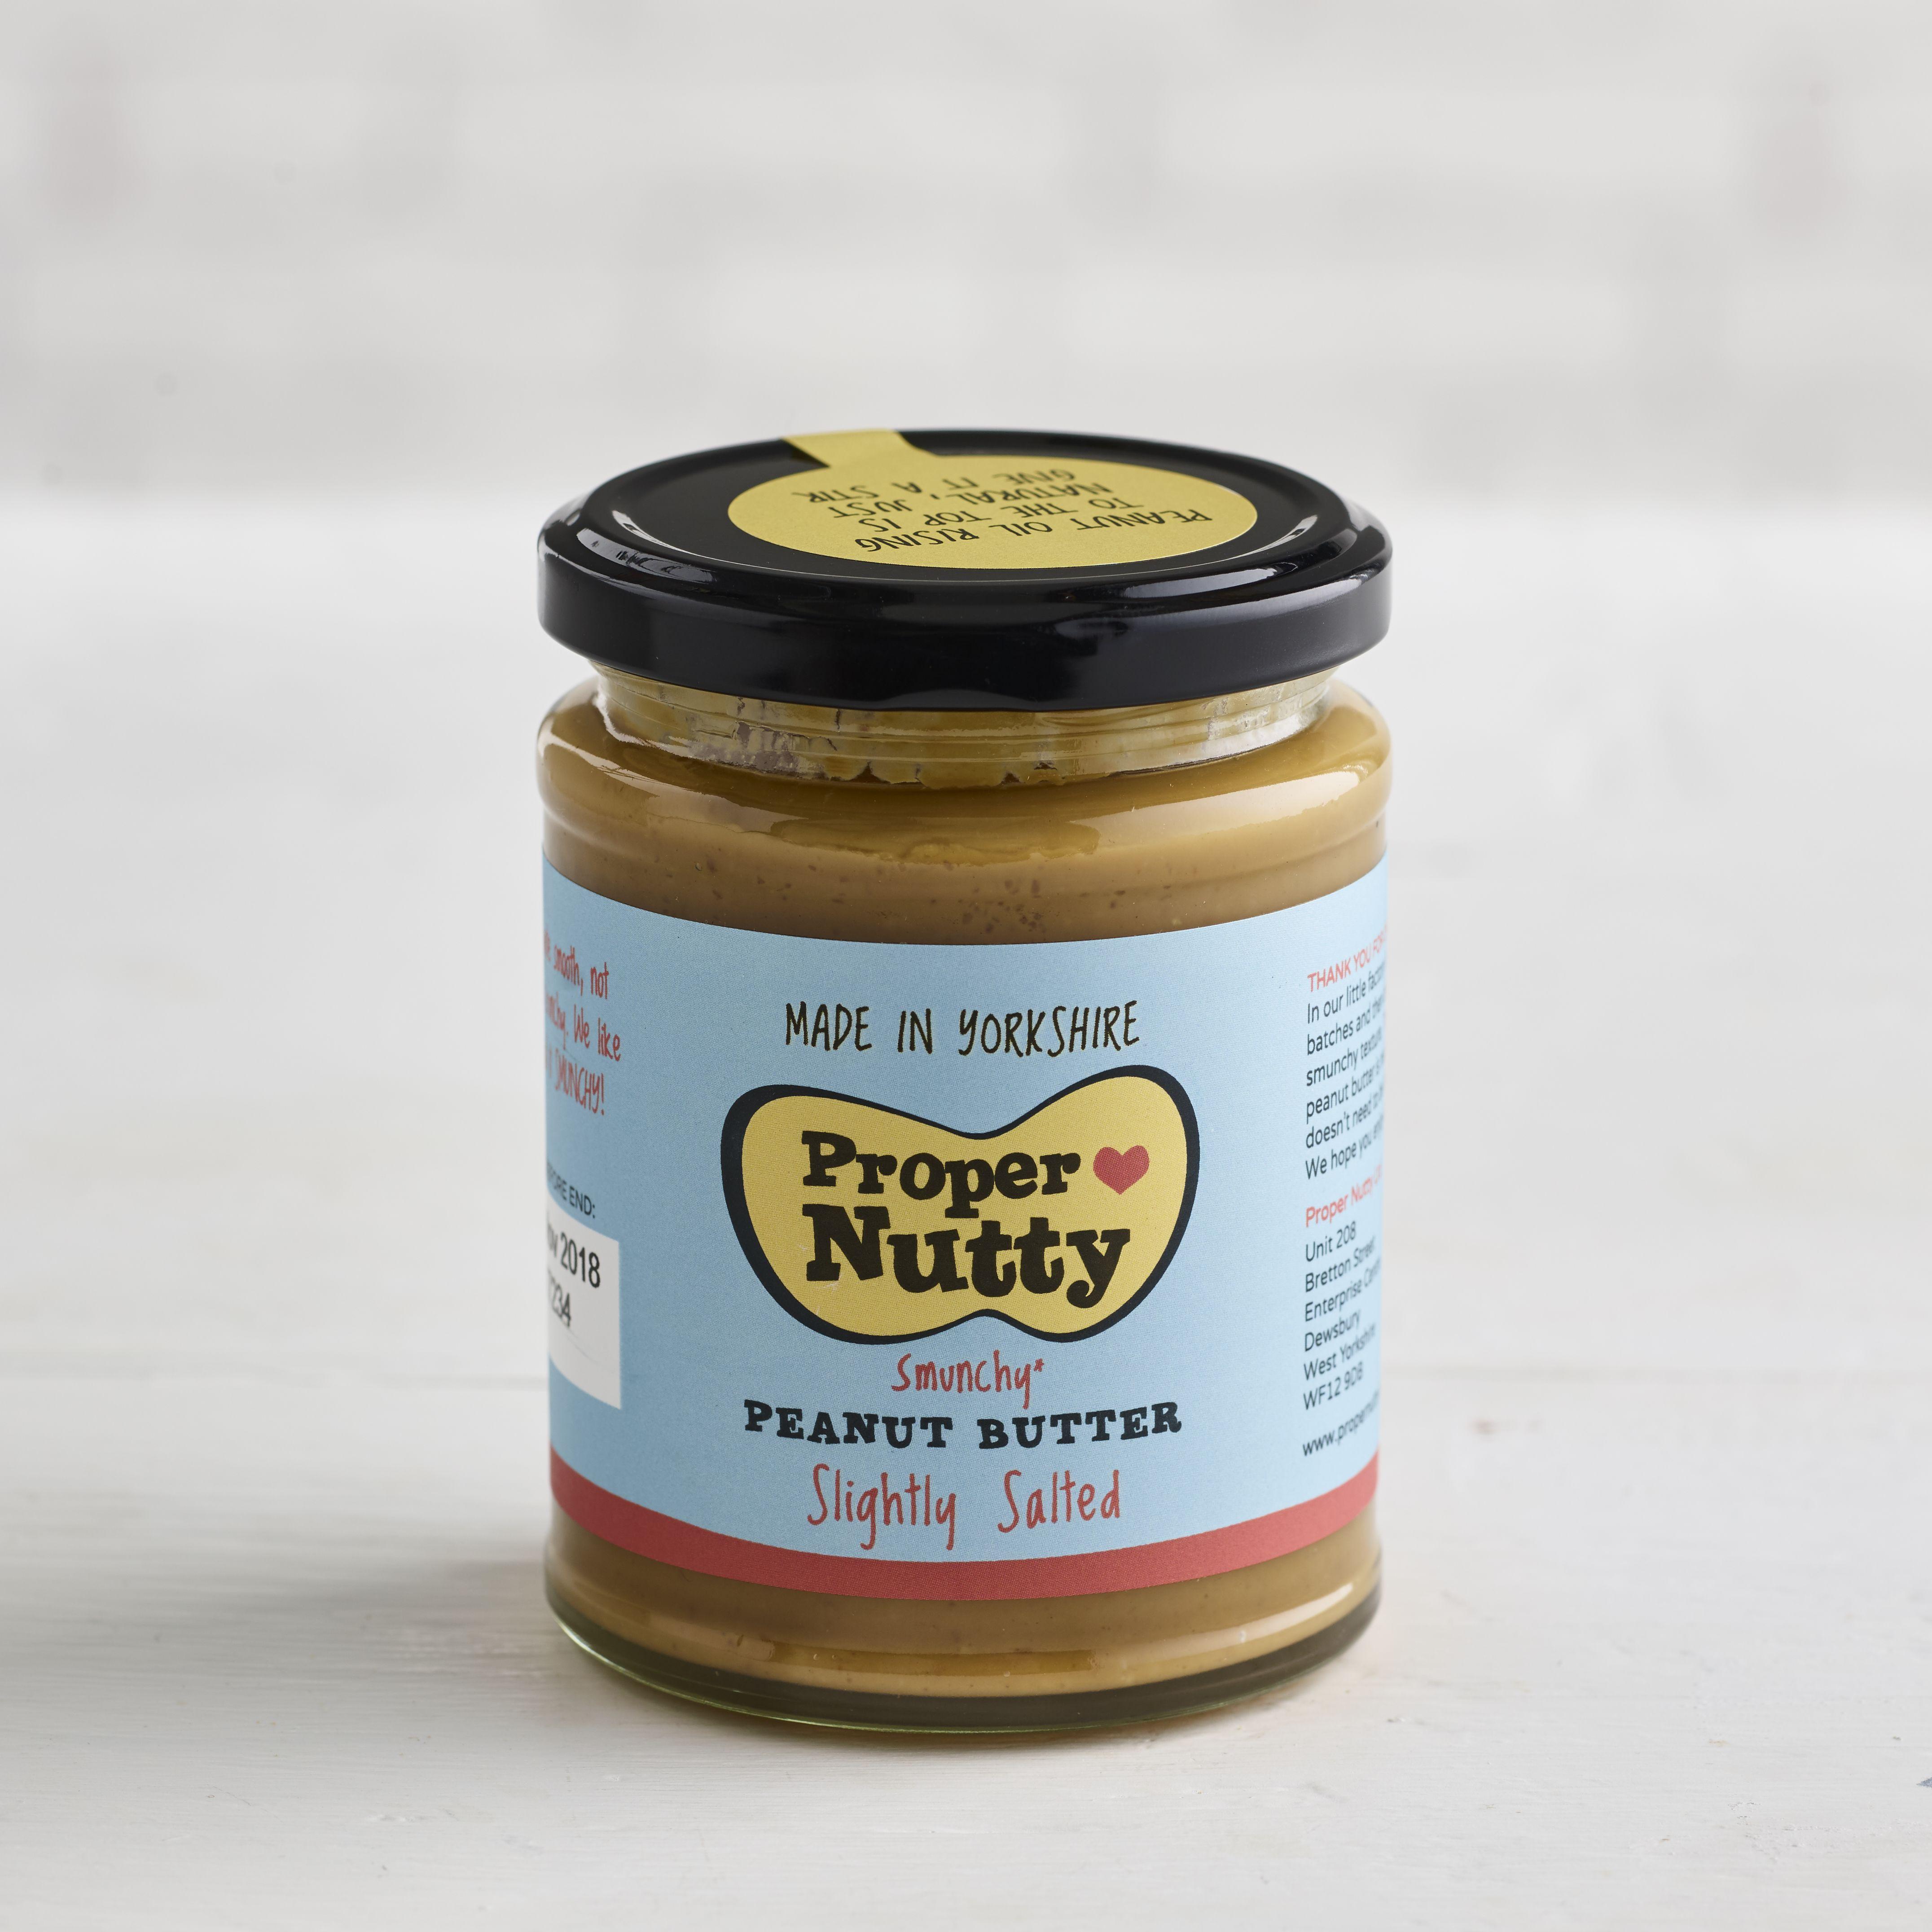 Proper Nutty Slightly Salted Peanut Butter, 280g